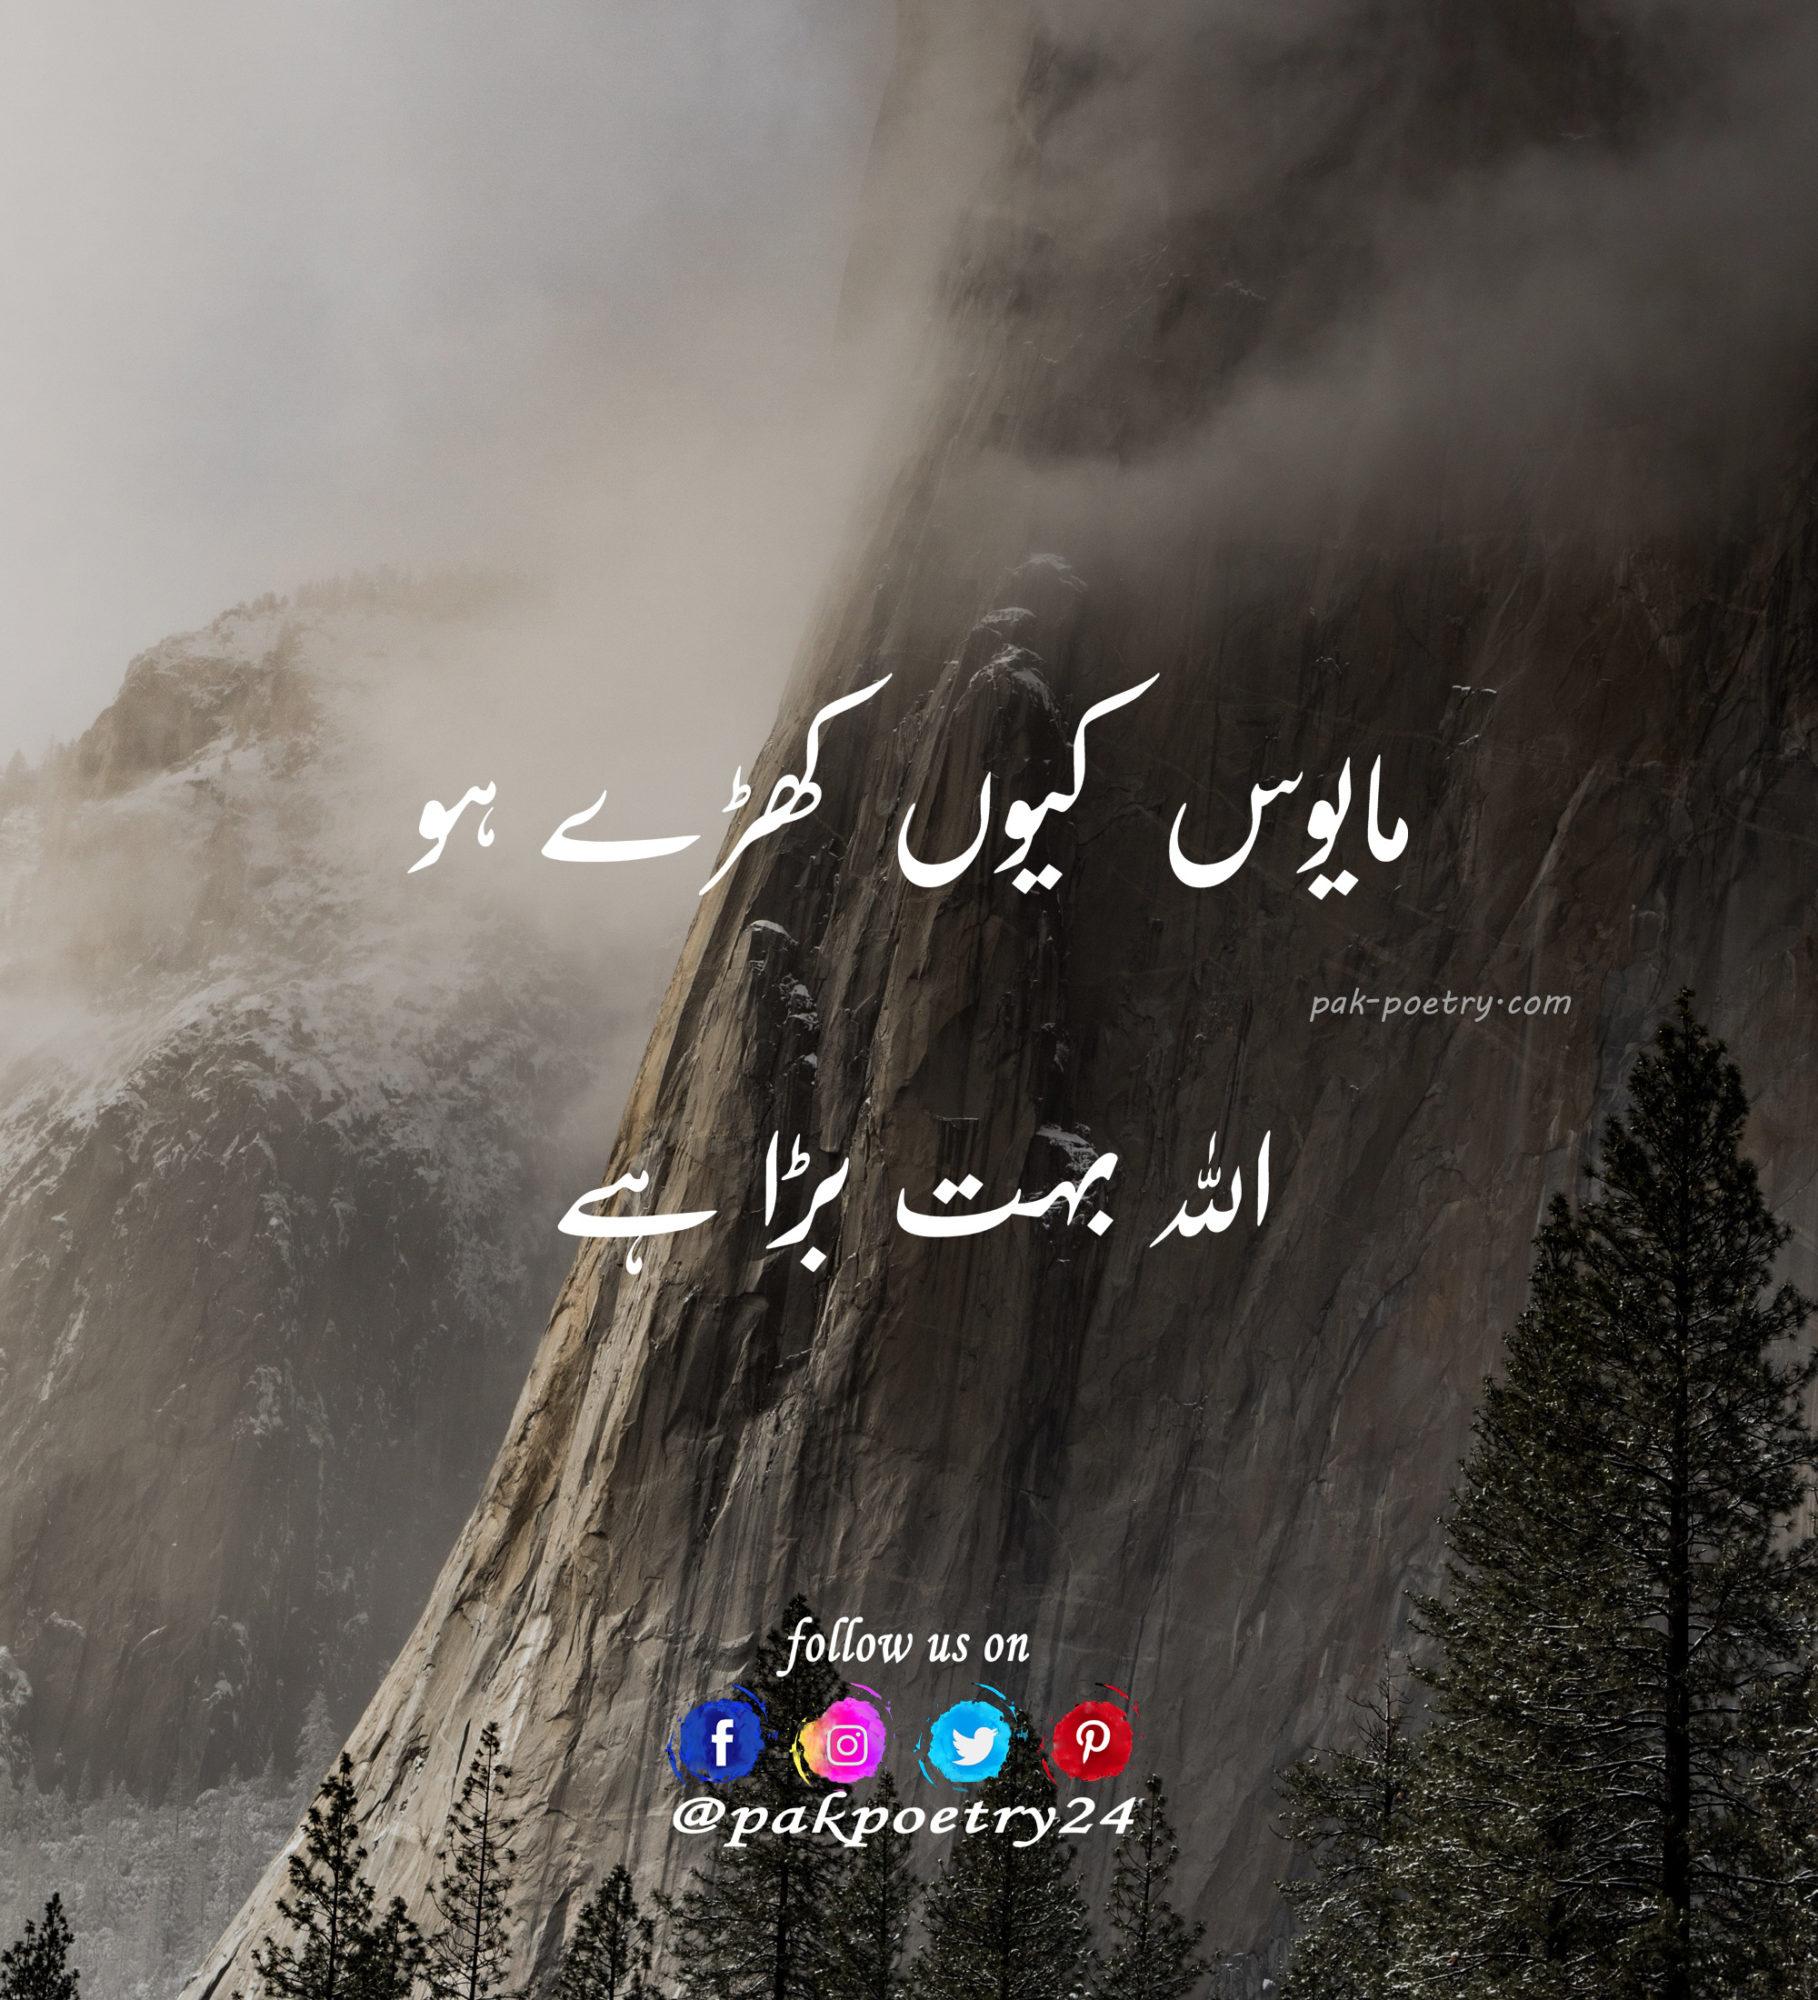 Islamic poetry, Islamic quotes in urdu, Islamic poetry in urdu, allah poetry, Islamic poetry in urdu 2020,